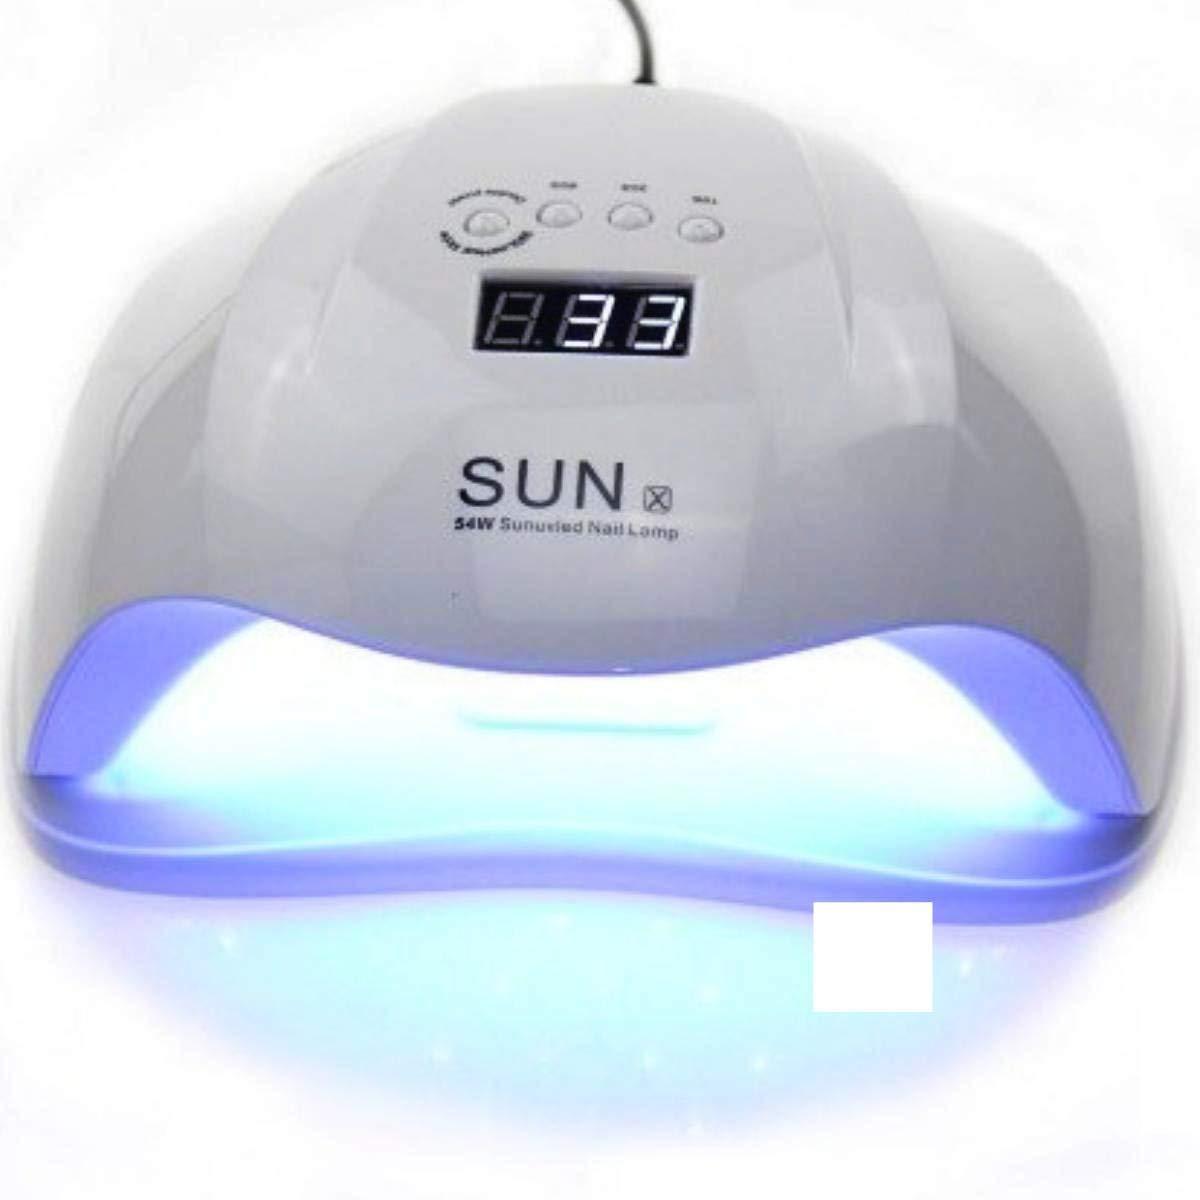 Cabine Sun X  LED - Timer/Sensor 54W - Estufa Forno